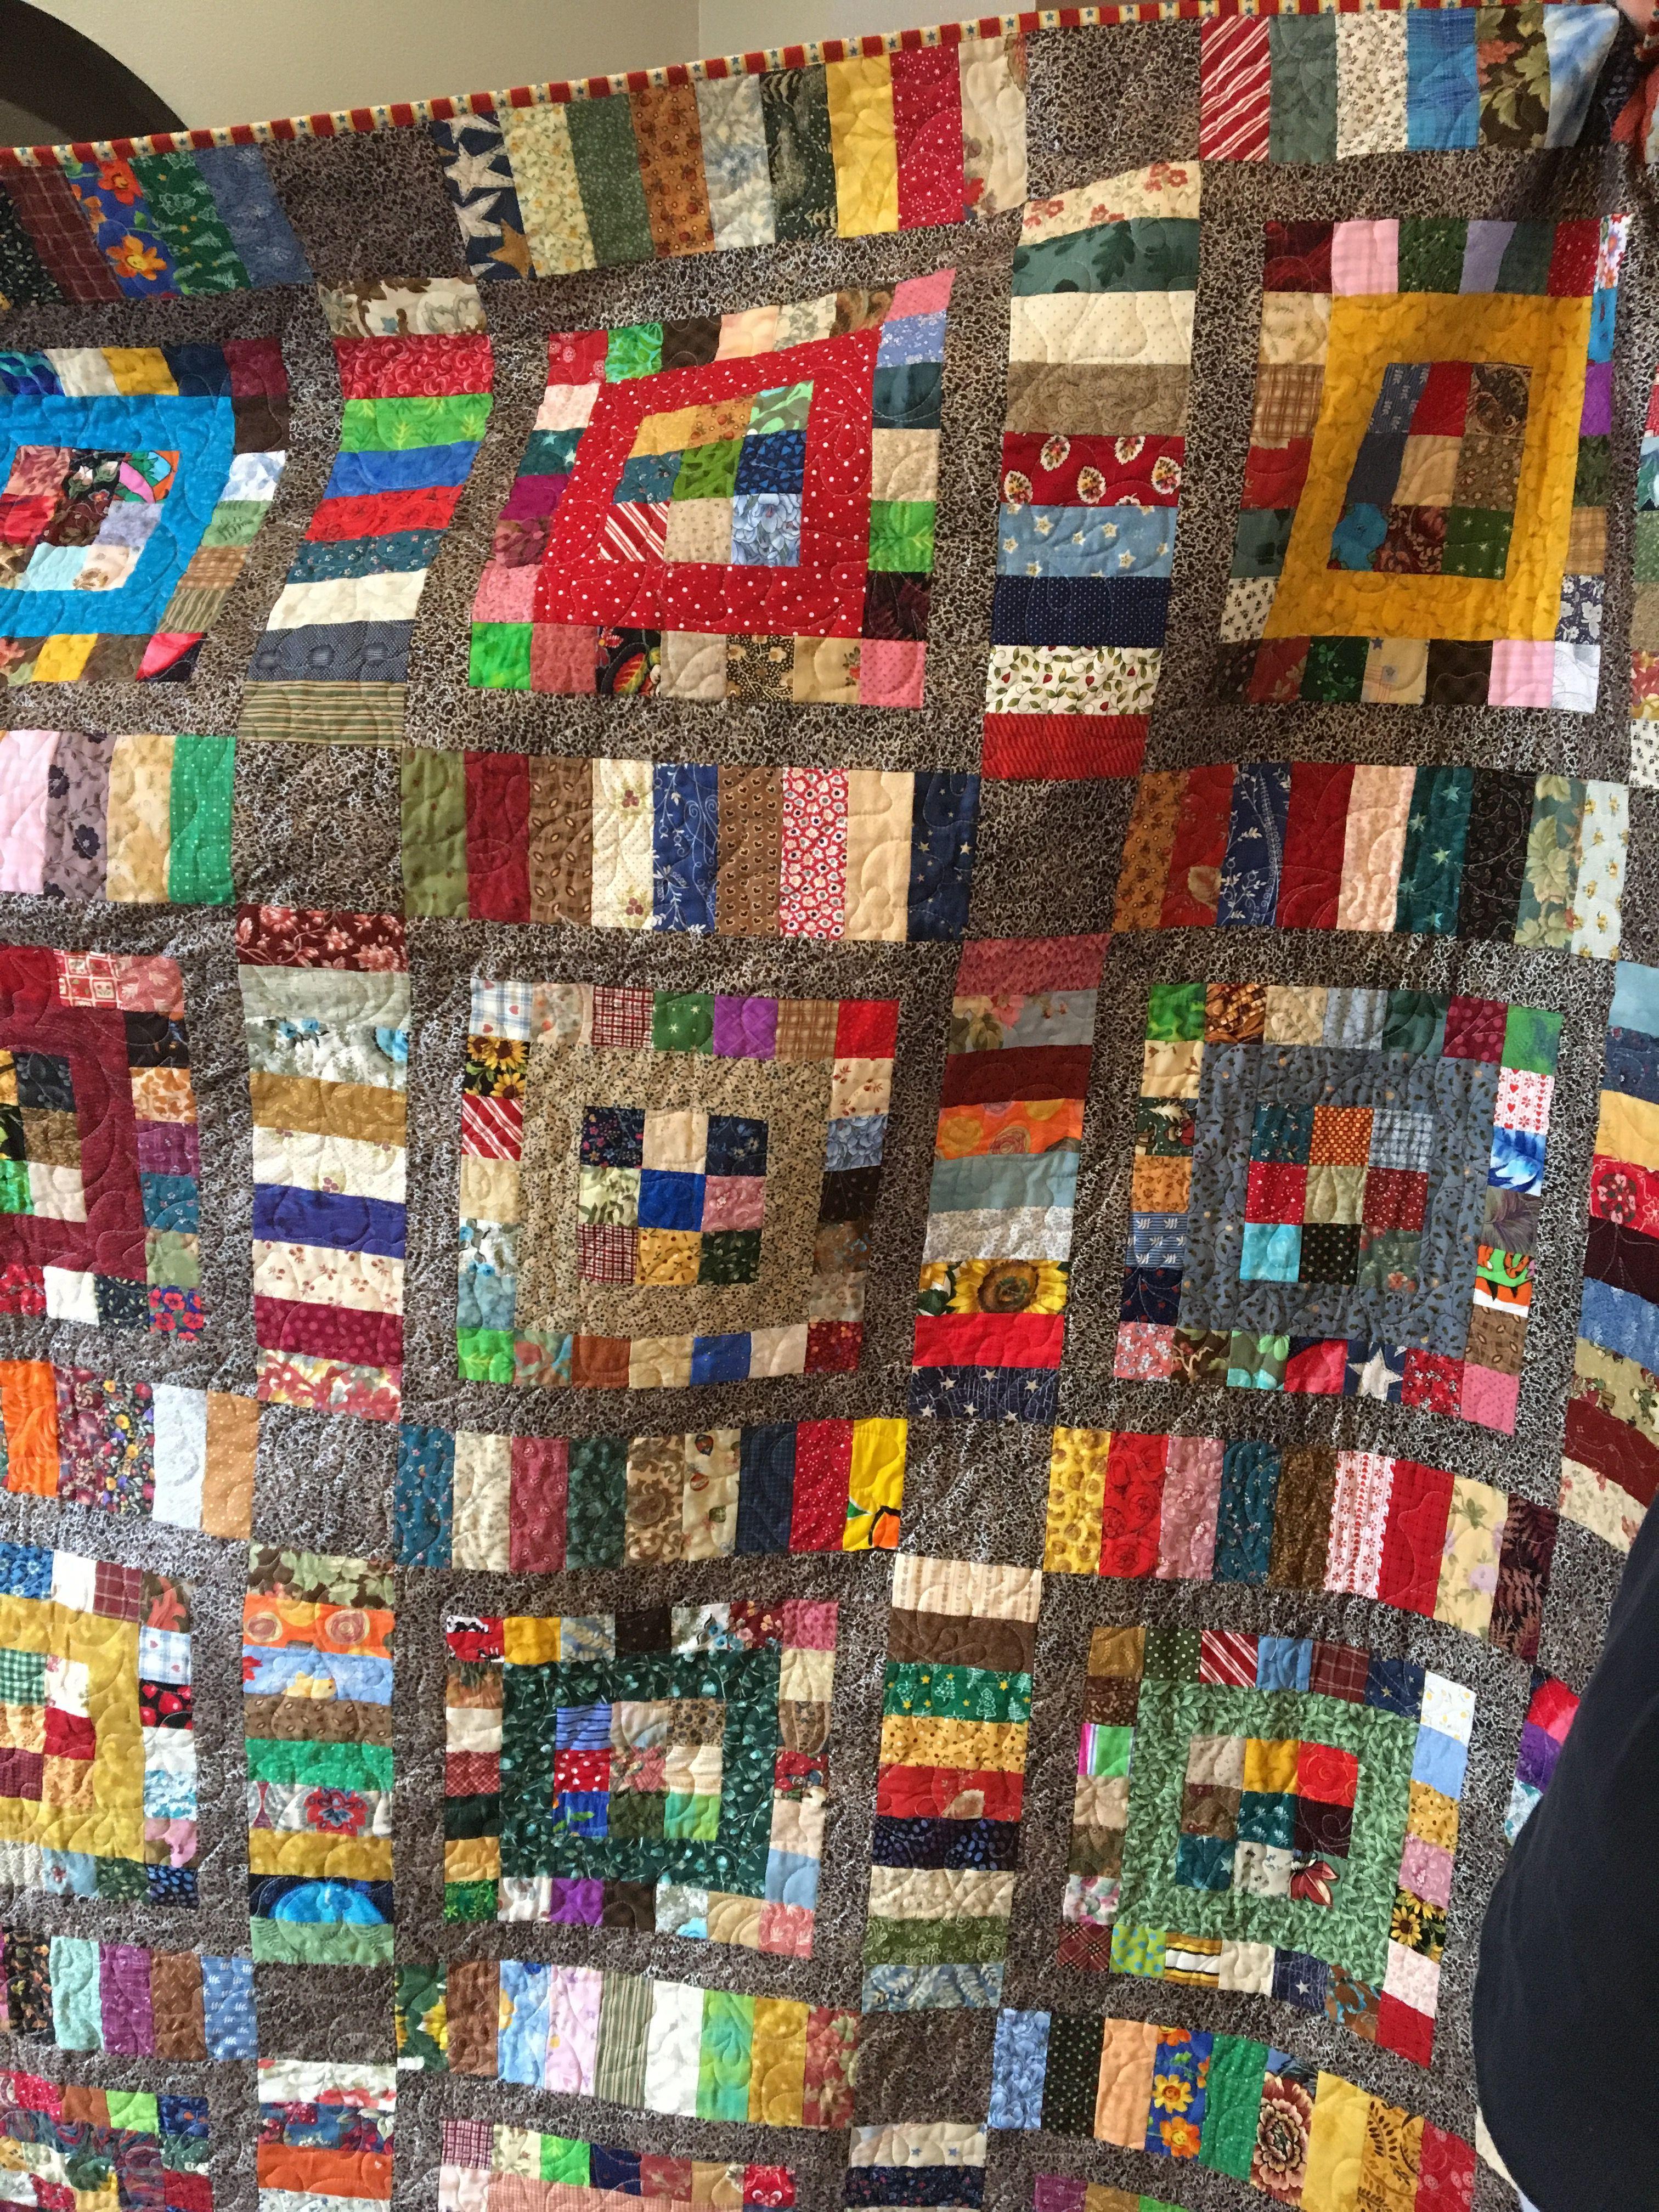 Pin von Claudia Ingram auf Quilts I want to make   Pinterest   Patchwork